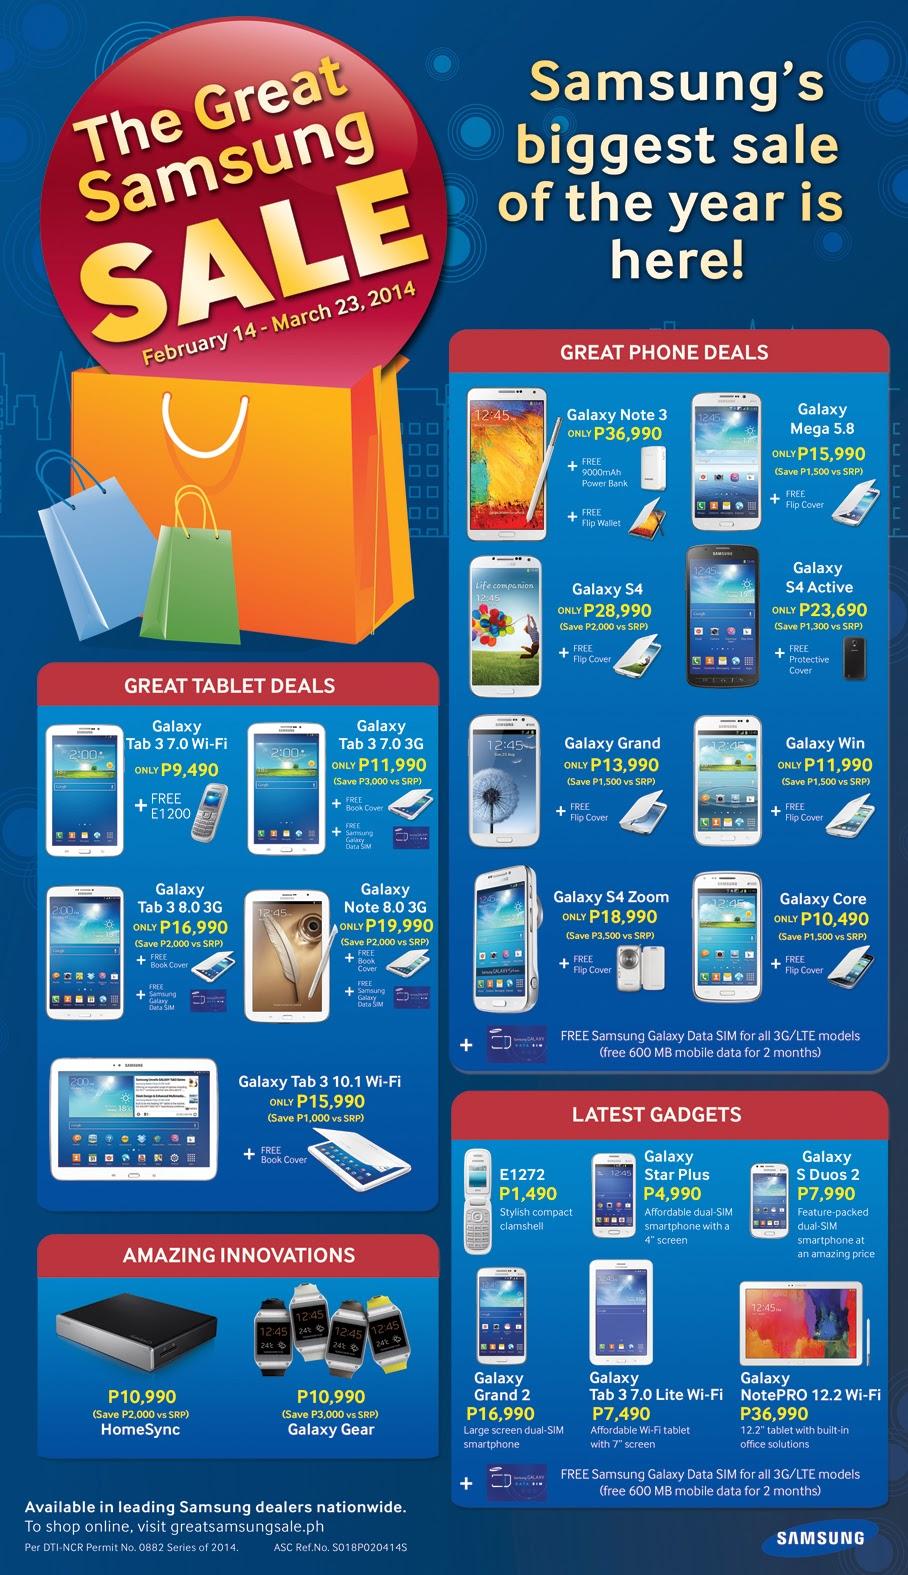 great samsung sale 2014 philippines